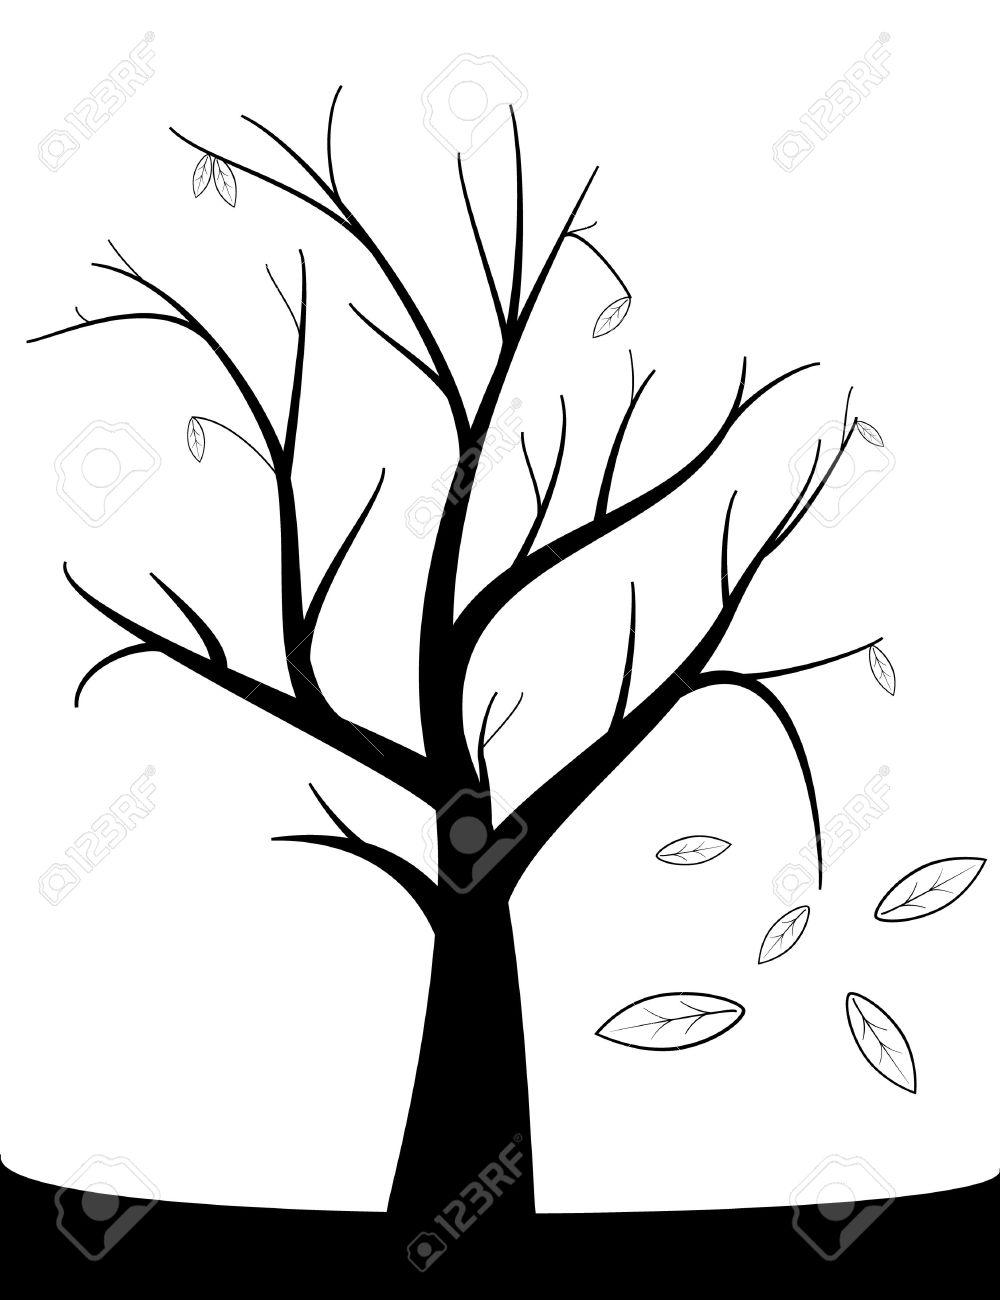 1000x1300 Drawn Dead Tree Leave Sketch